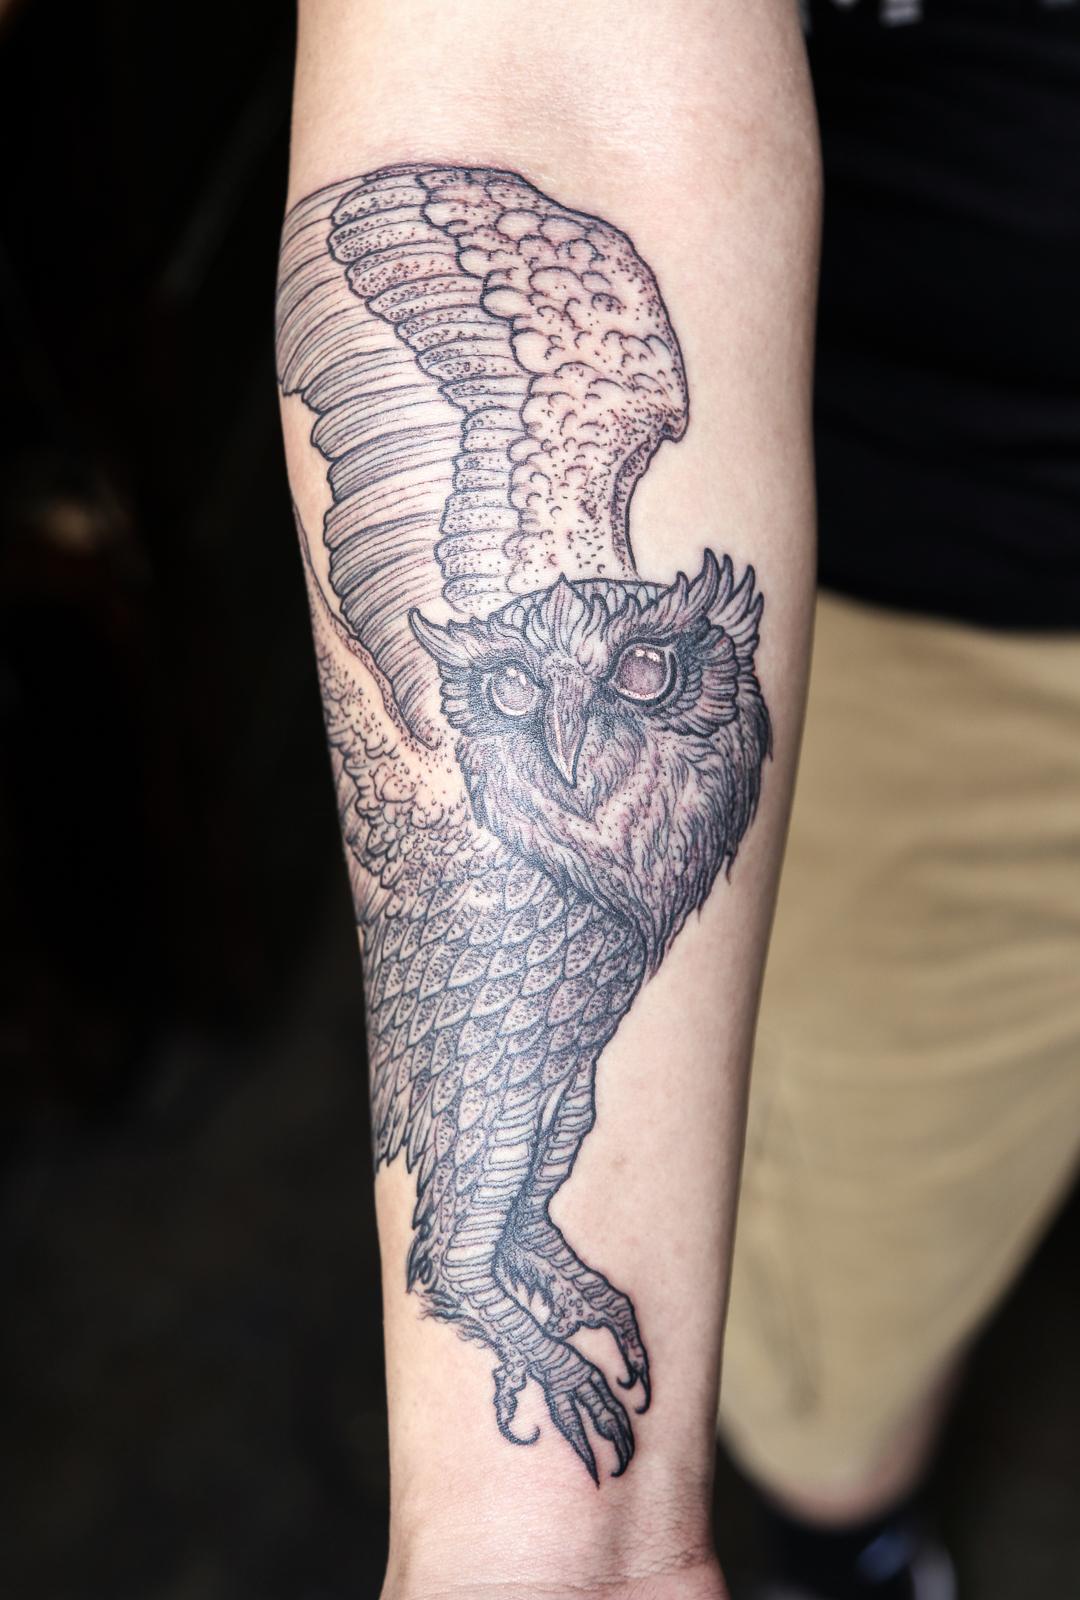 Owl 1 enrique bernal ejay tattoo.jpg